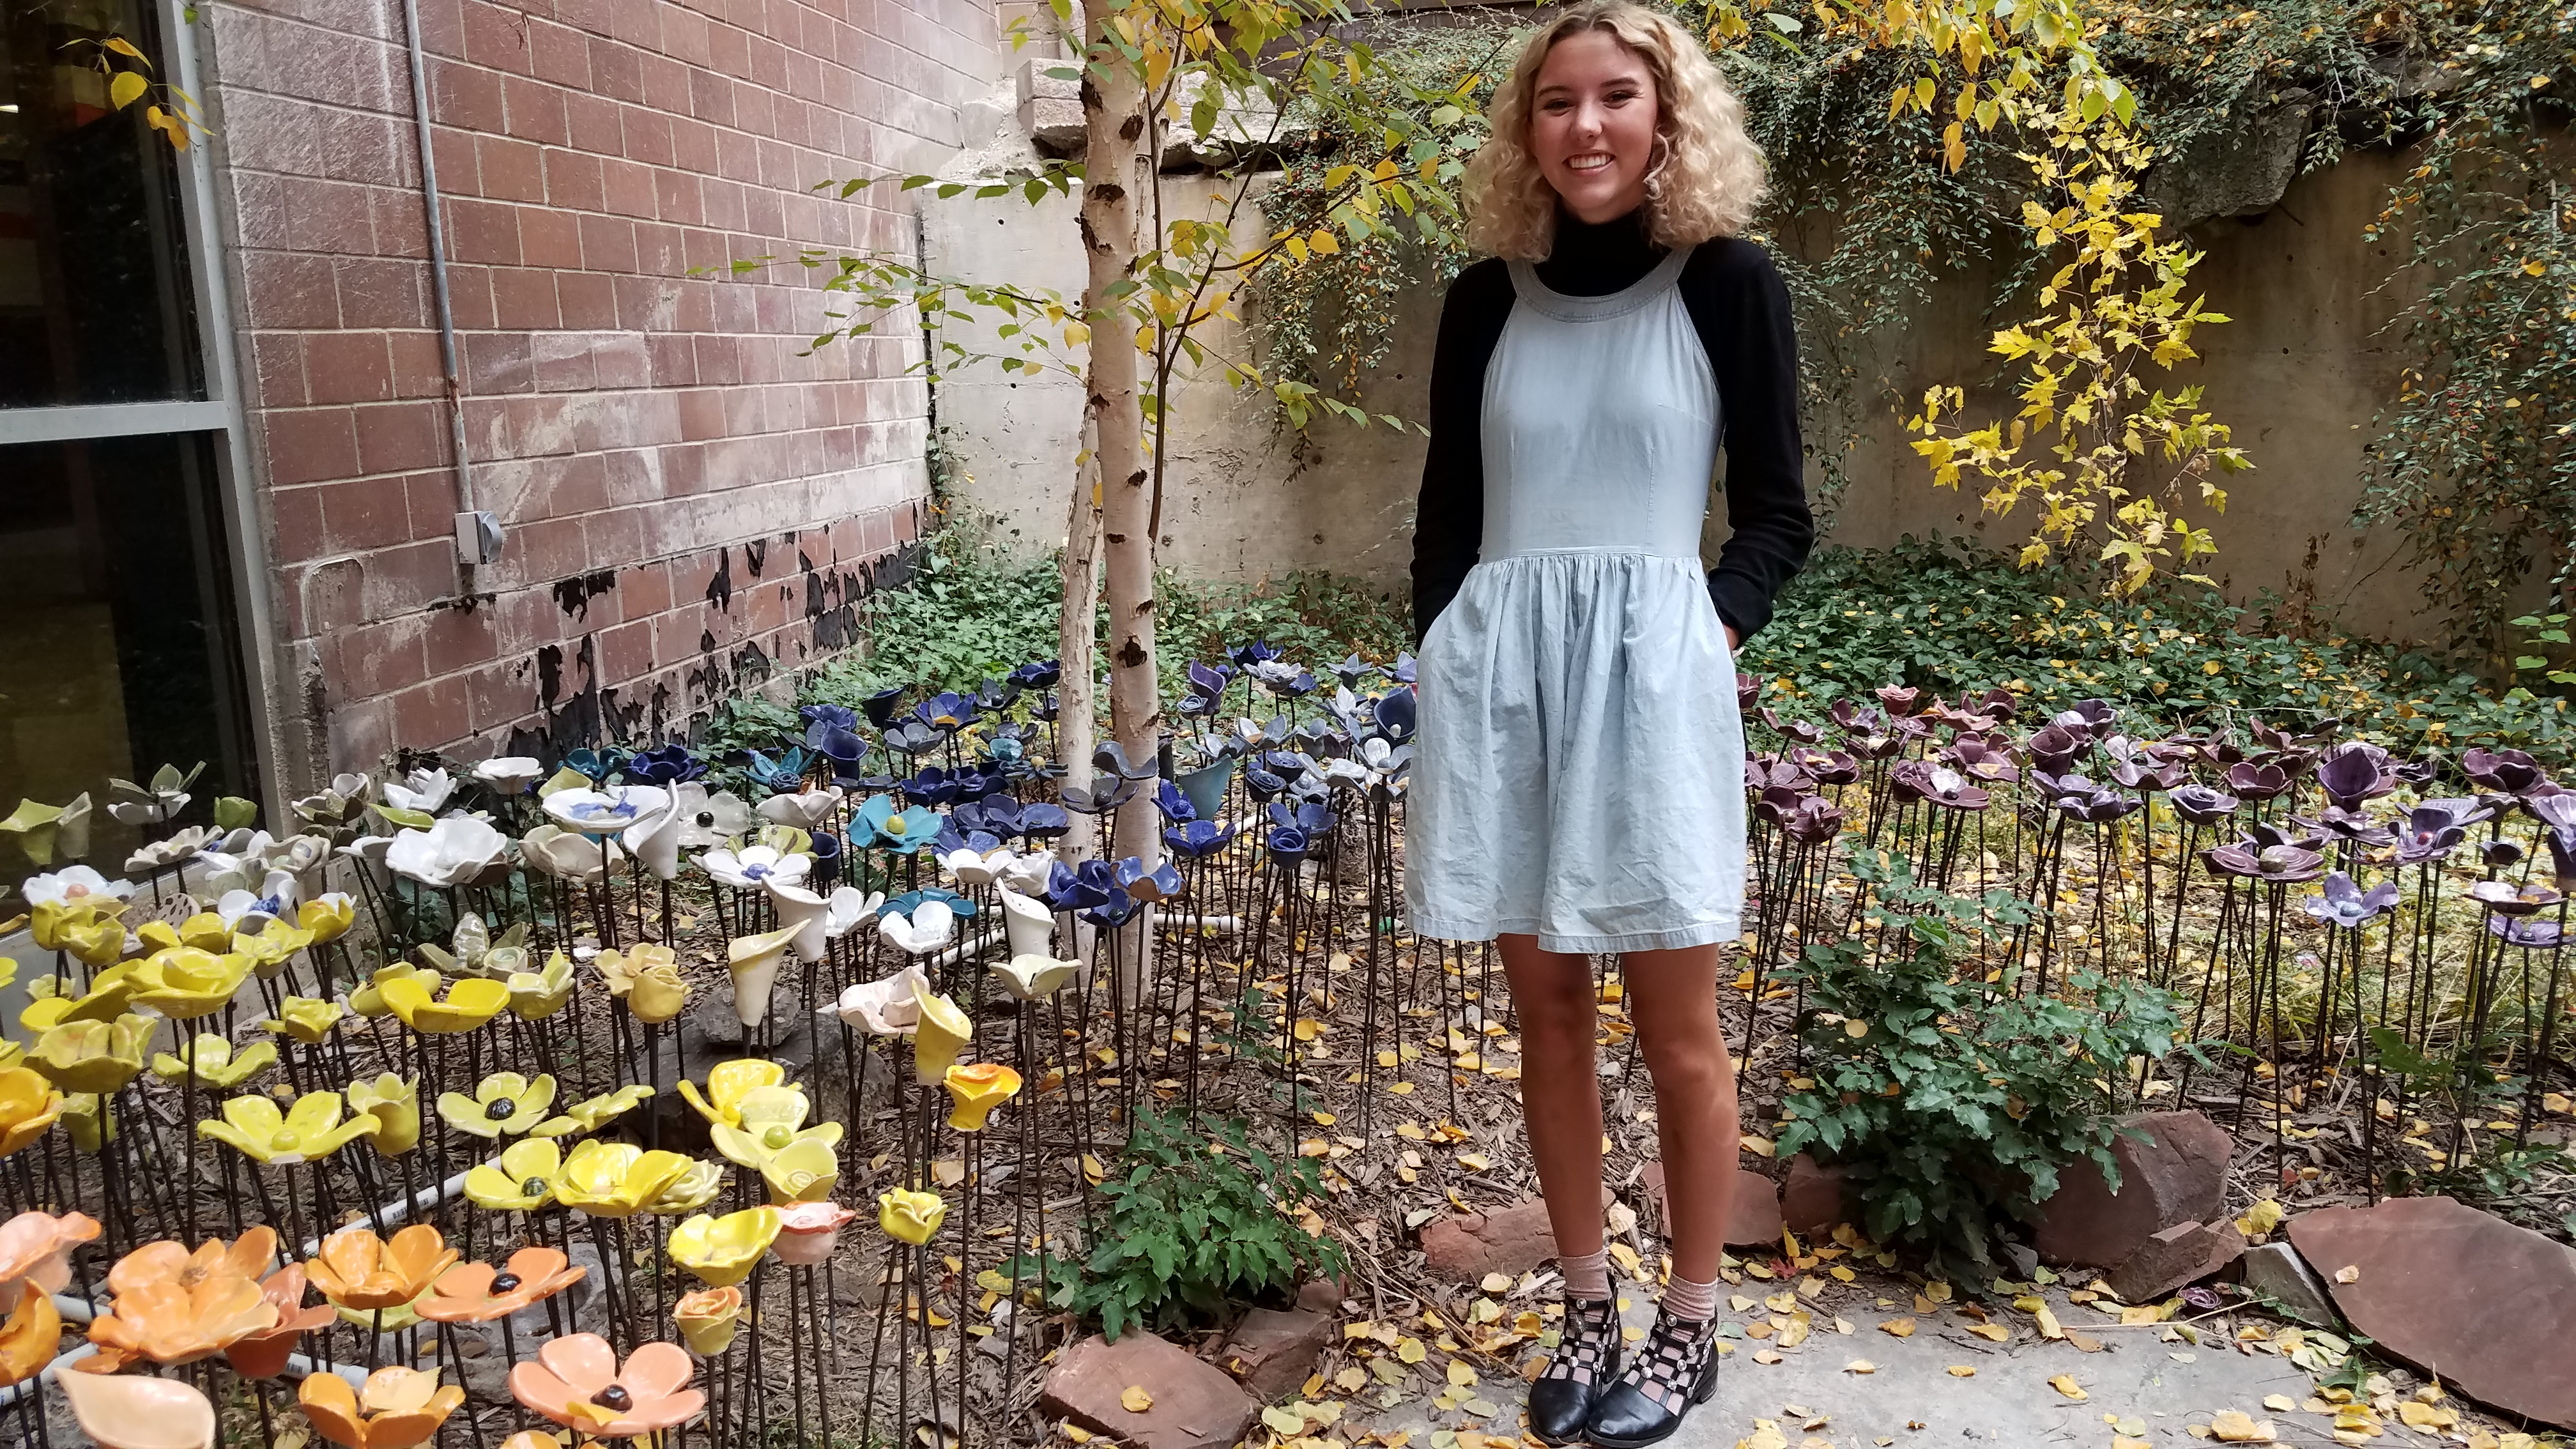 Ceramics Flowers Moved to Atrium